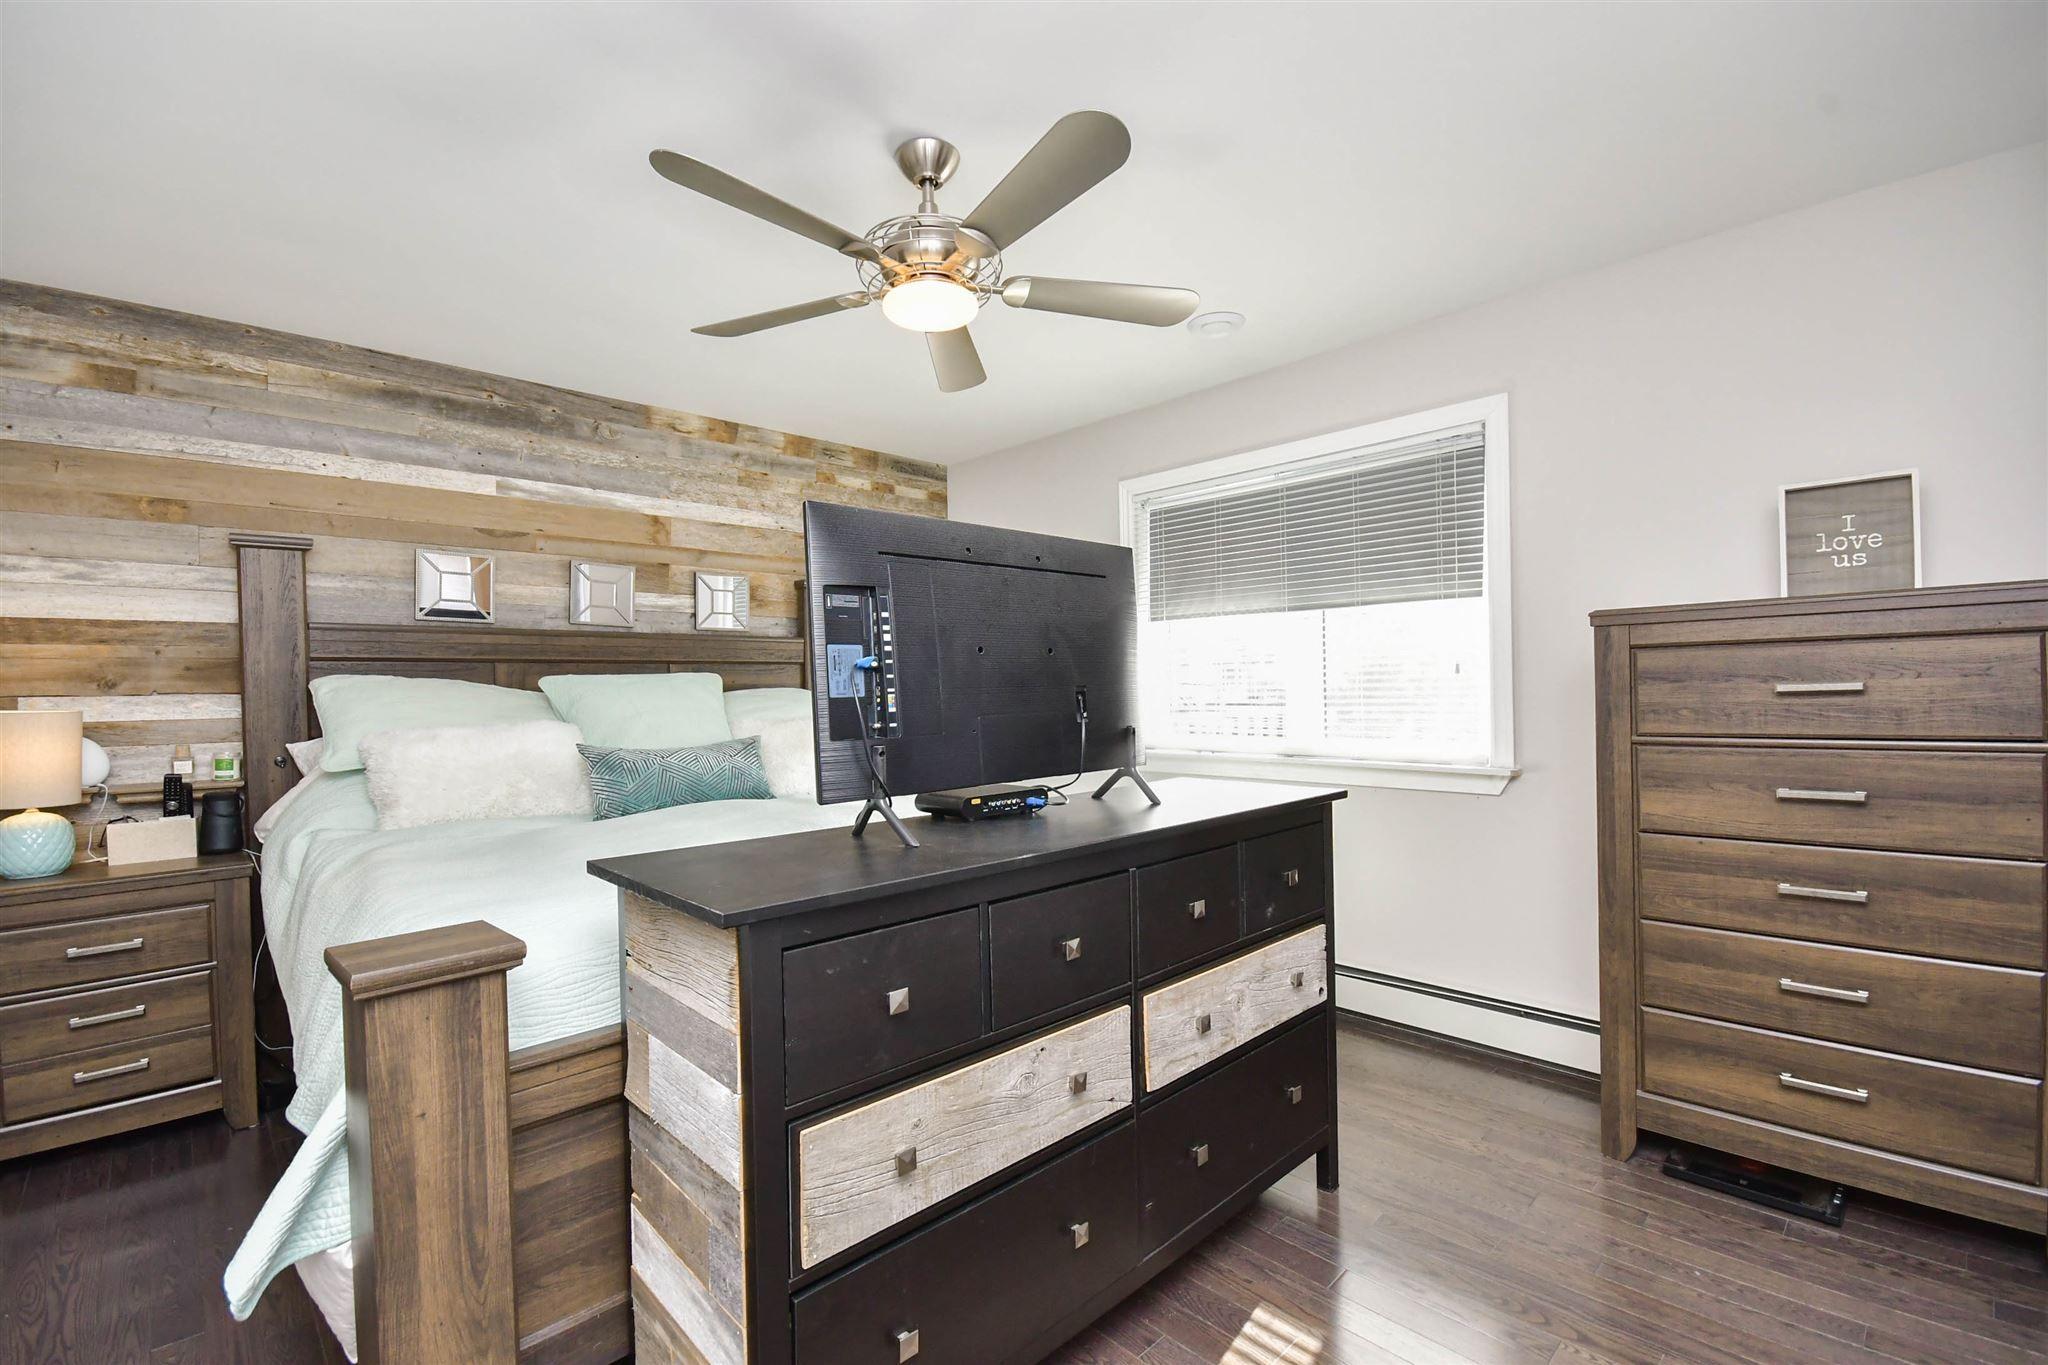 Photo 10: Photos: 17 Armstrong Court in Halifax: 5-Fairmount, Clayton Park, Rockingham Residential for sale (Halifax-Dartmouth)  : MLS®# 202105075